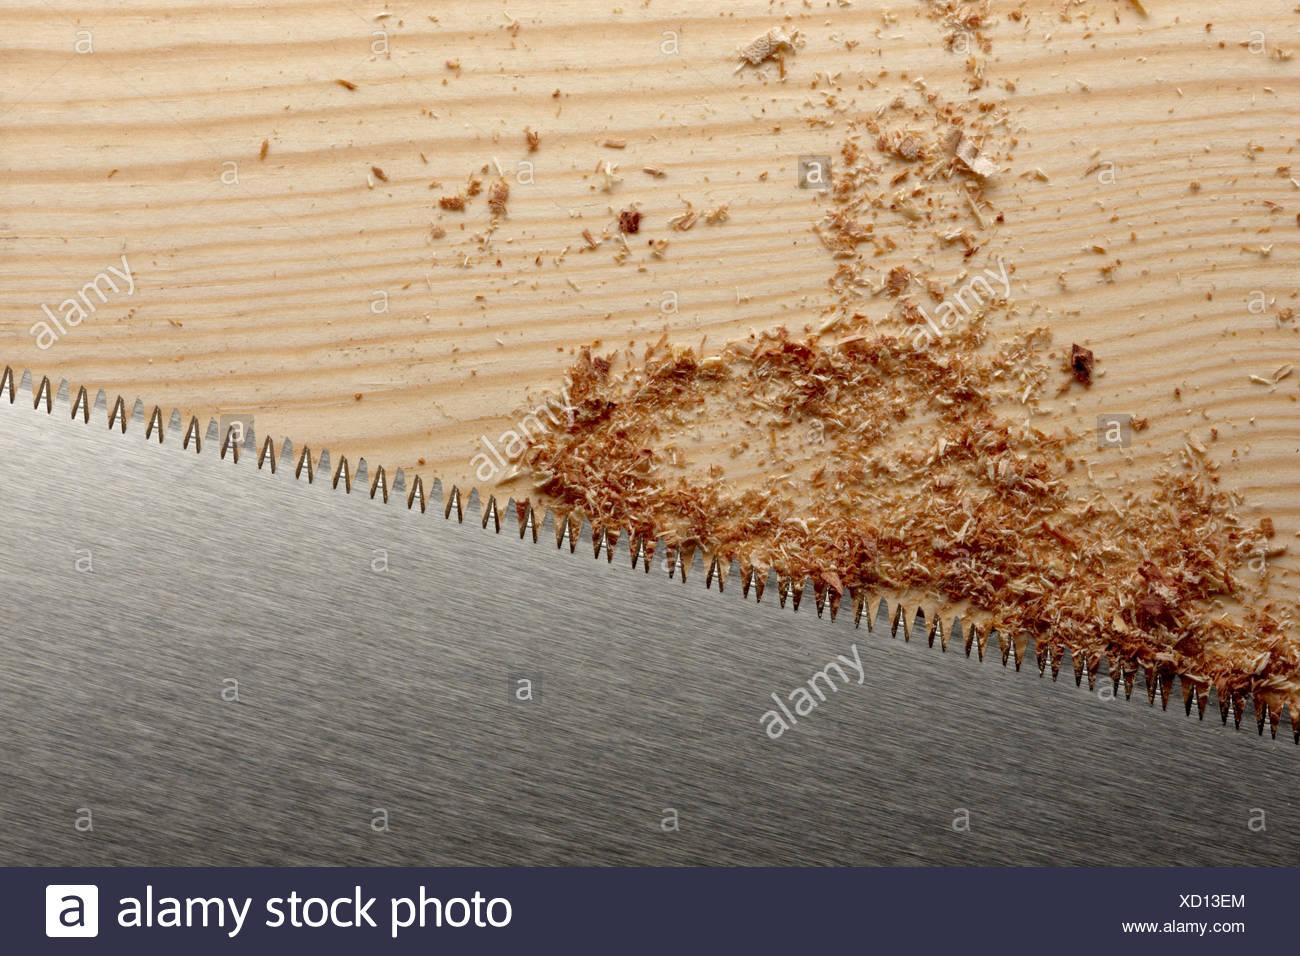 Saw blade - Stock Image